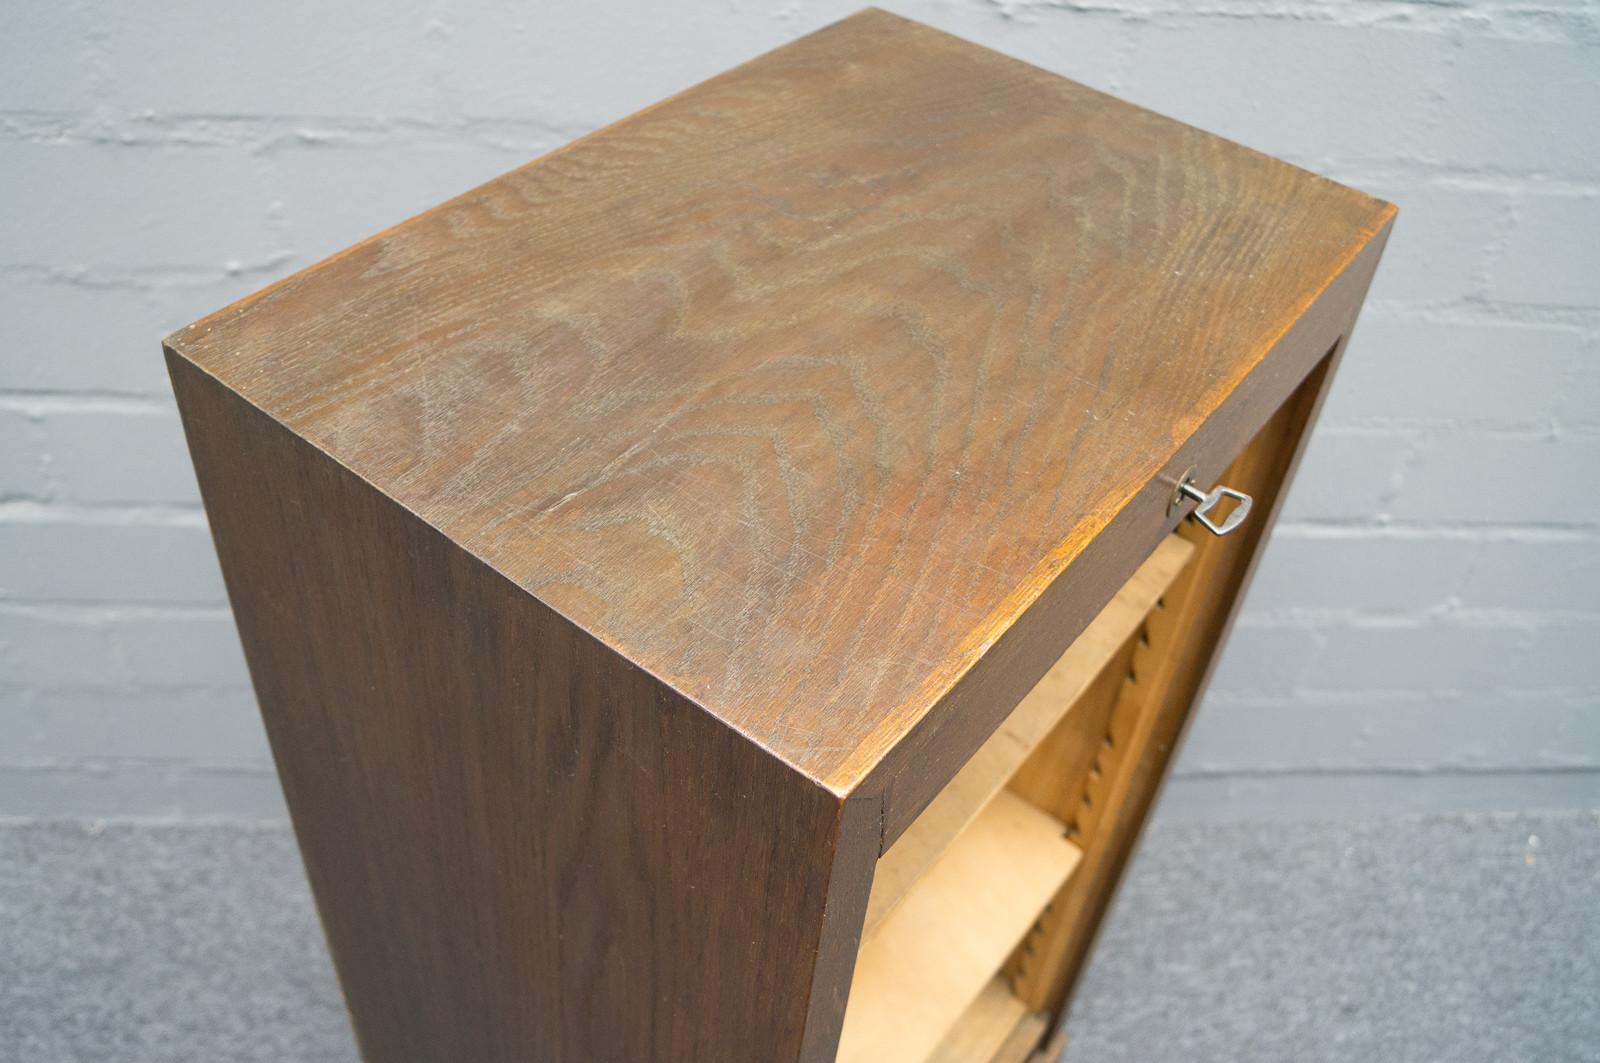 artz deco rolladenschrank kommode rolladen schrank ebay. Black Bedroom Furniture Sets. Home Design Ideas